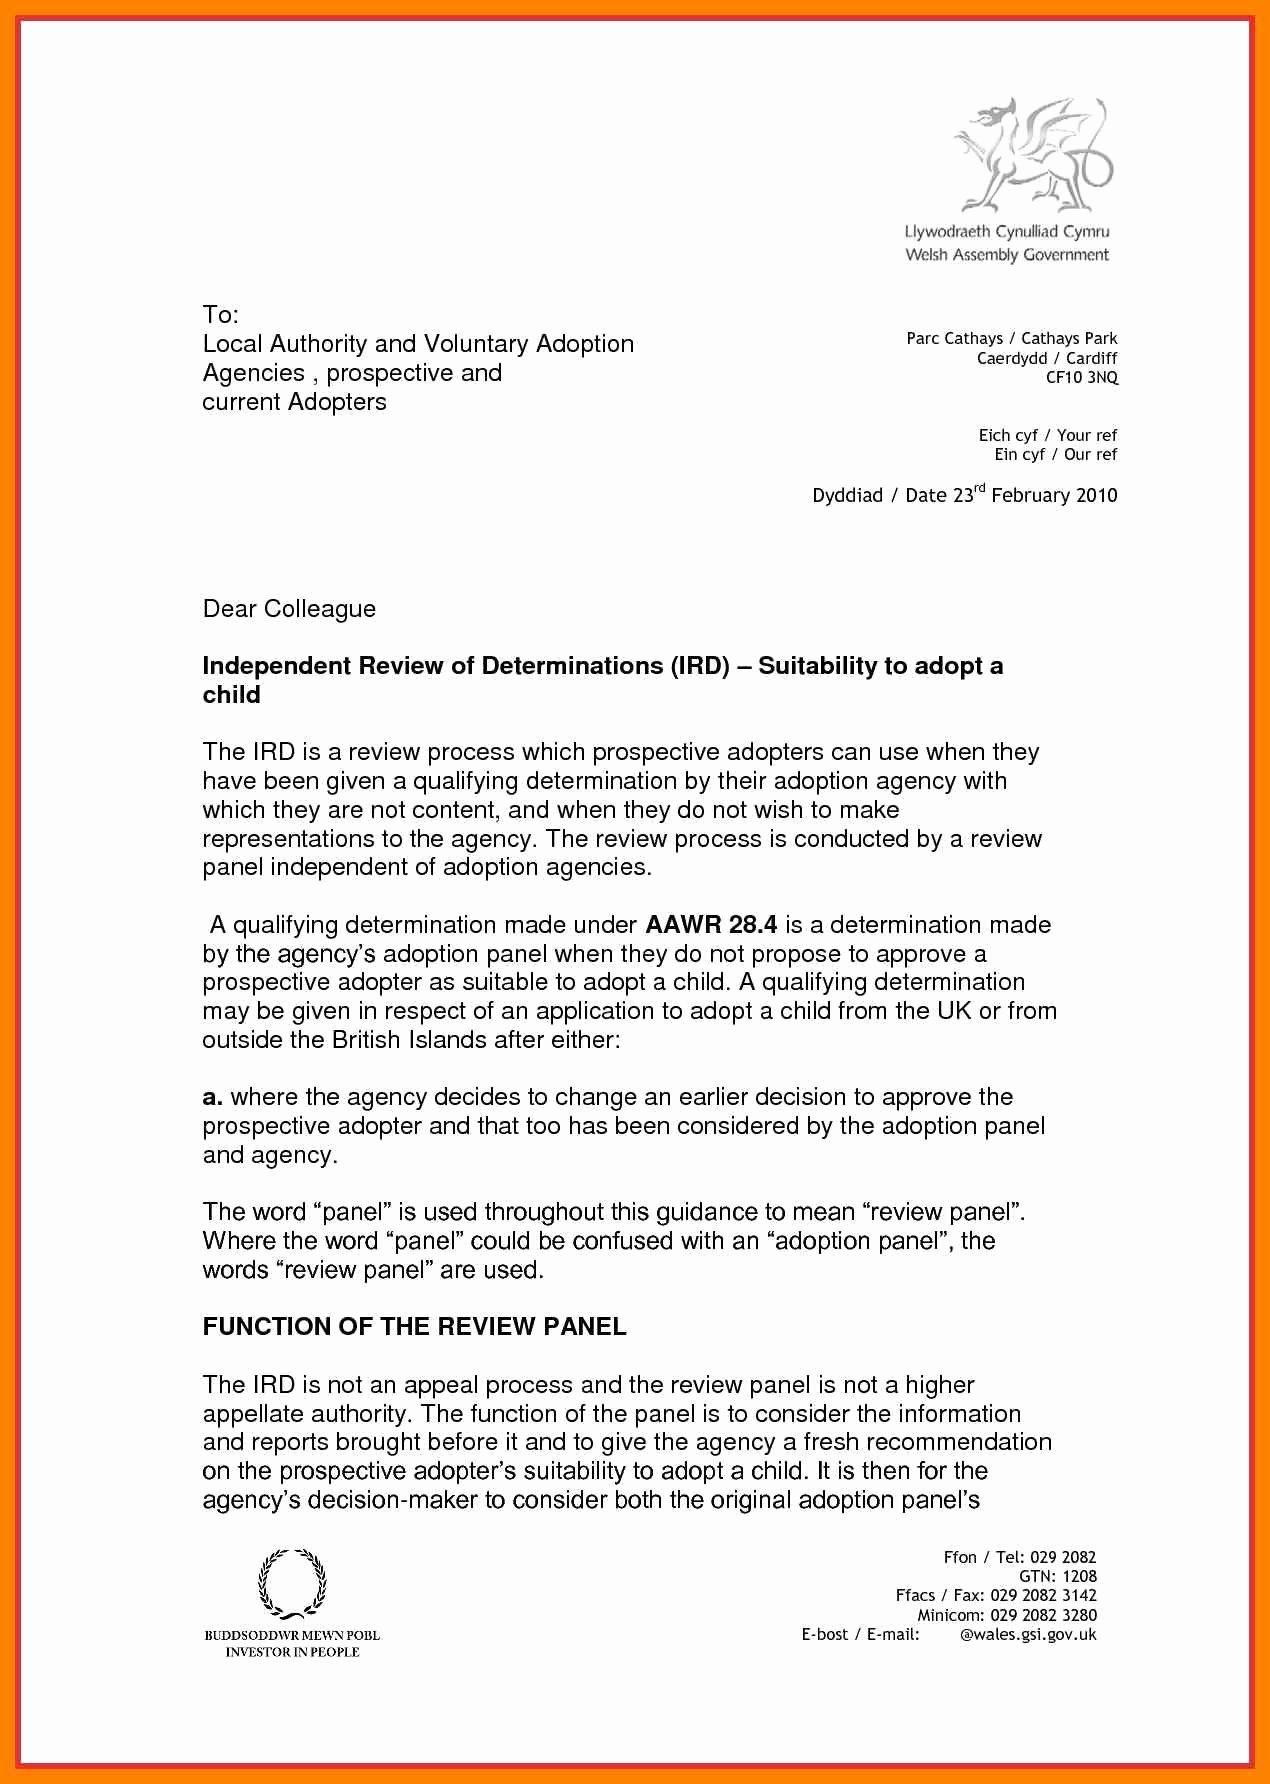 Adoption Recommendation Letter Sample Elegant 15 Adoption Letter Sample